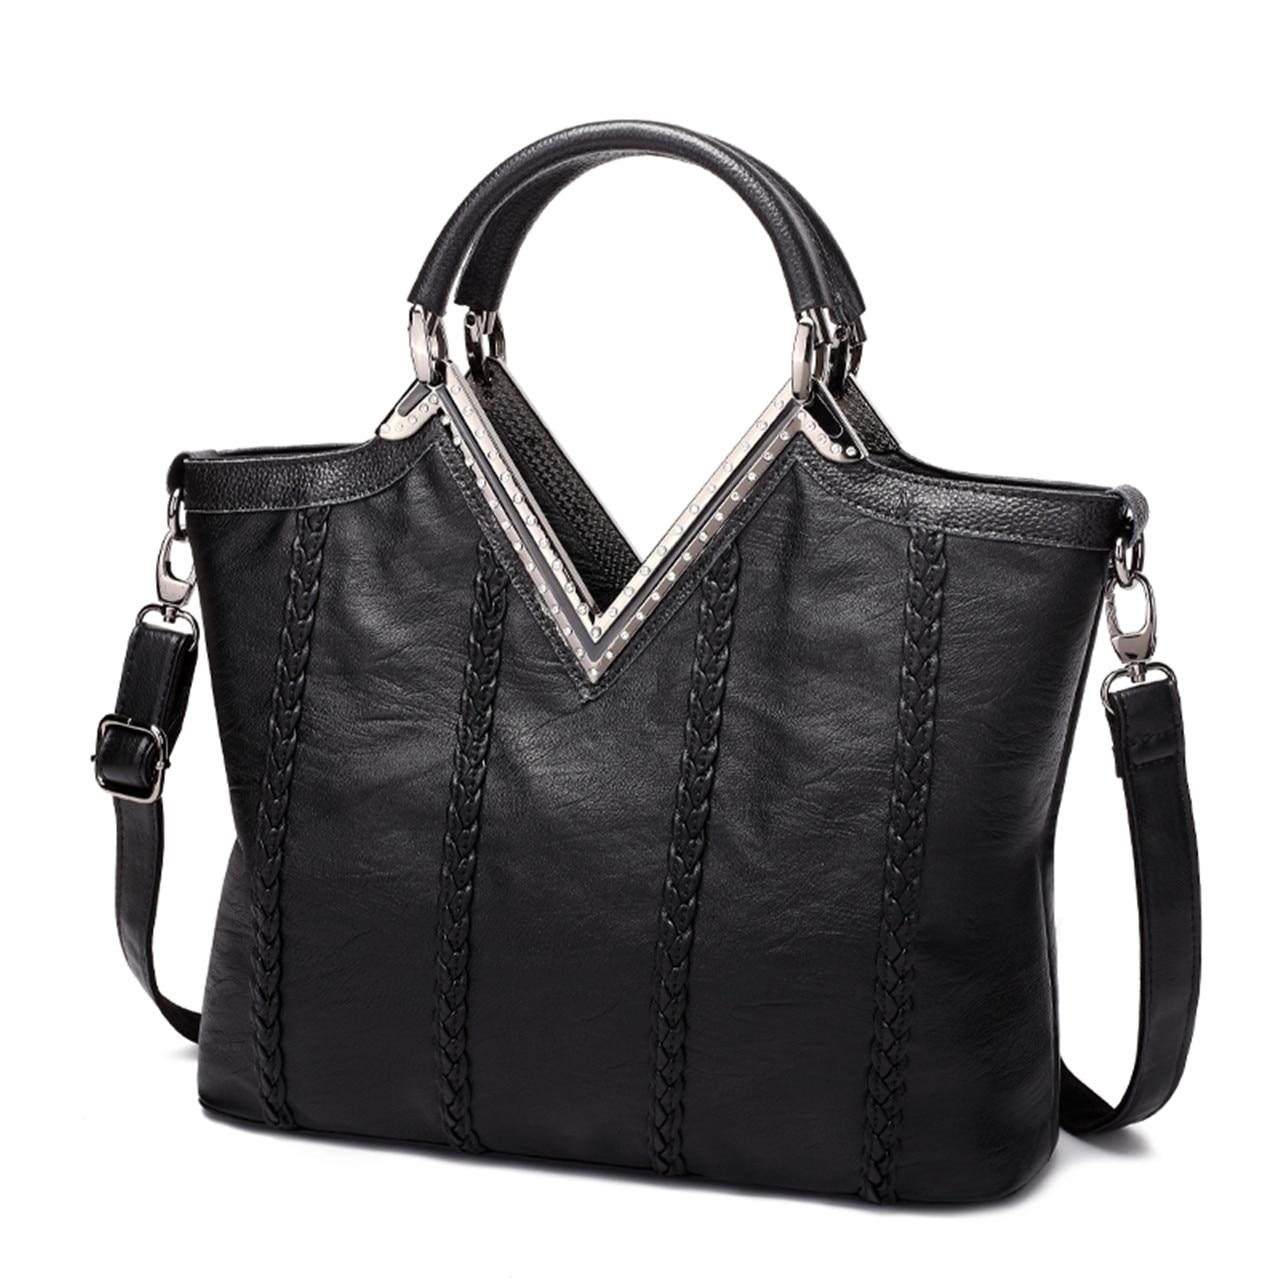 ФОТО 2016 Brand New Women's Top-Handle Bags Handbags Pu Leather Weave Vintage Crossbody Bag Designer Tote Bag